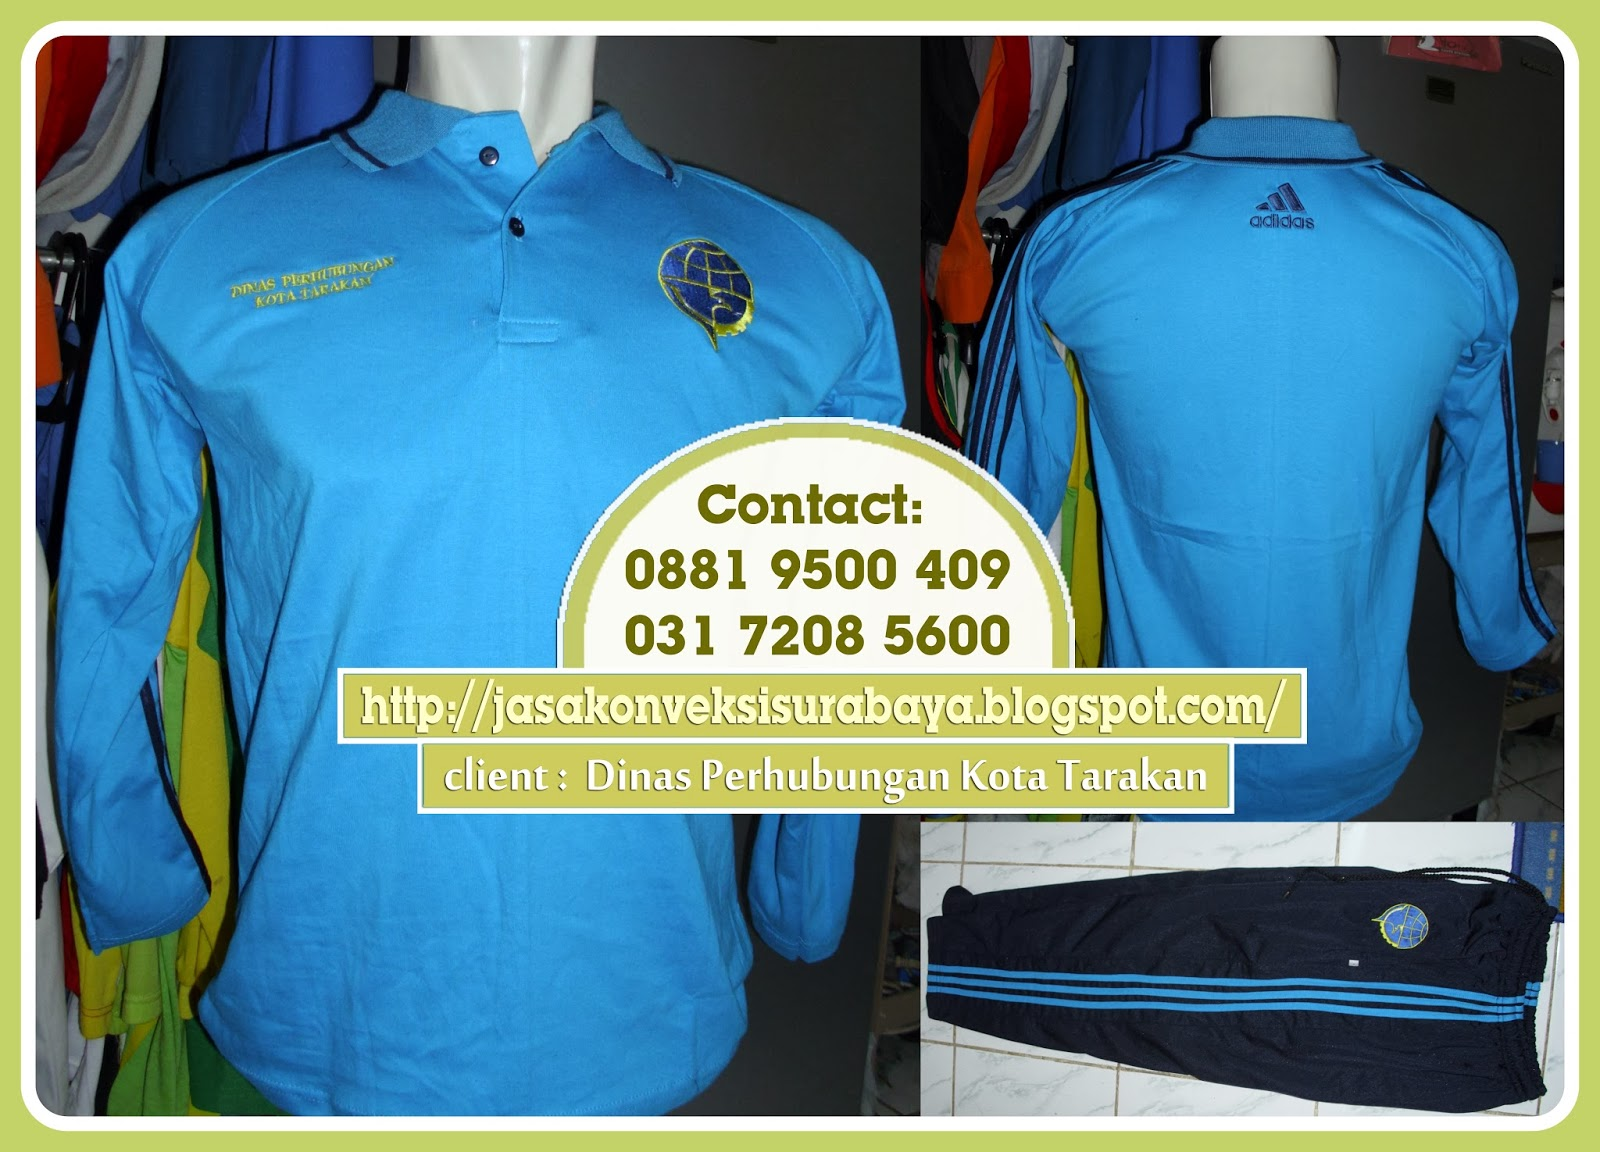 jual seragam olahraga bordir, jual seragam olahraga instansi, jual seragam olahraga di surabaya, pesan seragam olahraga